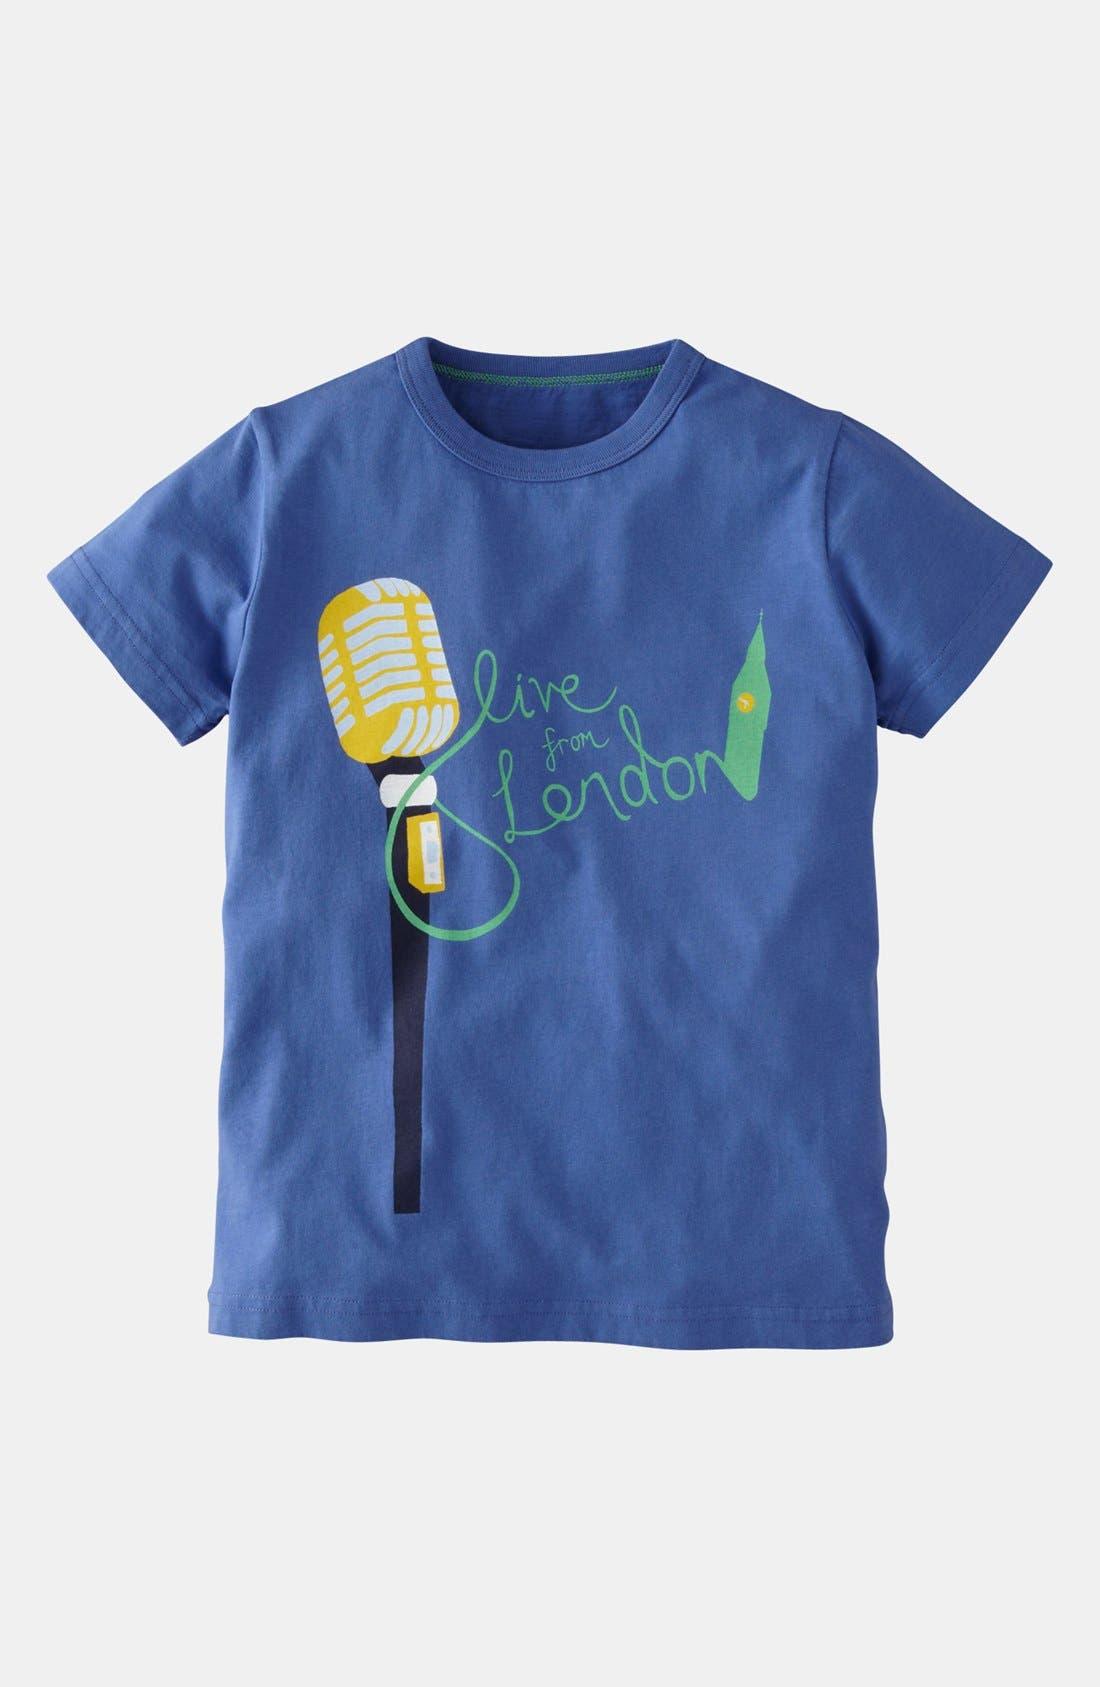 Alternate Image 1 Selected - Mini Boden 'Icon' T-Shirt (Toddler, Little Boys & Big Boys)